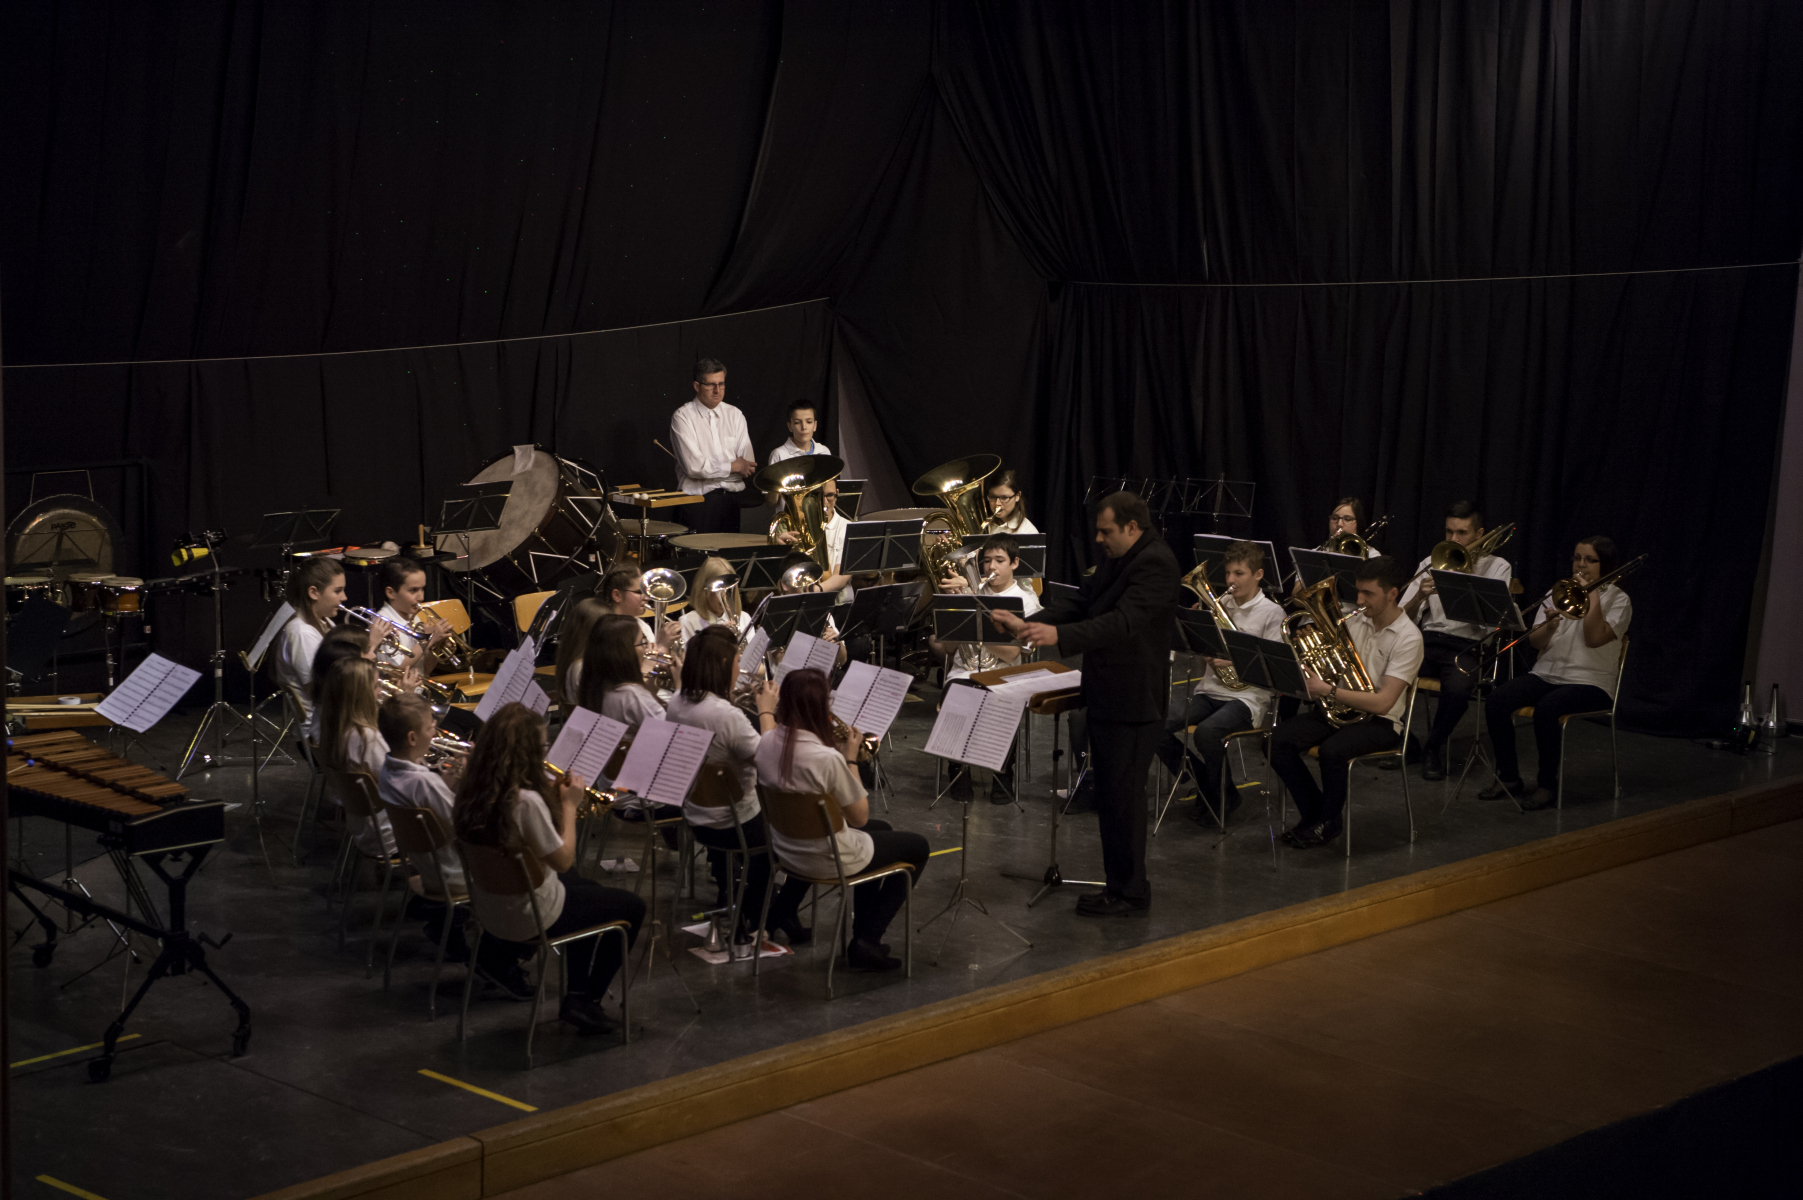 170211_concert_annuel17-025